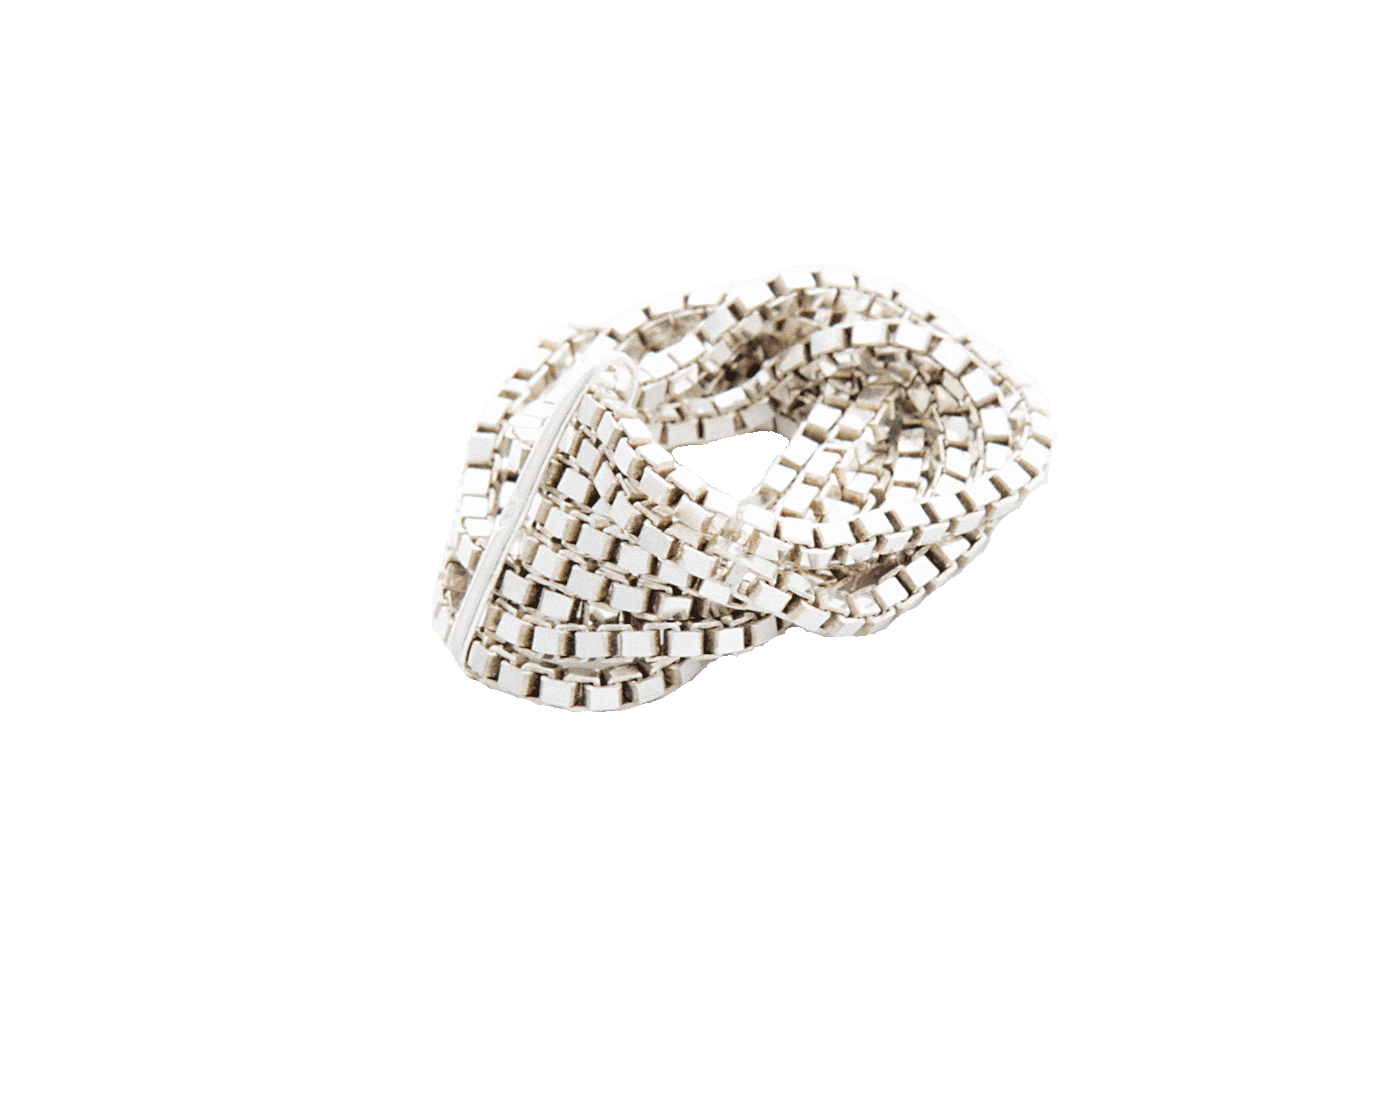 Adeline Cacheux Jewelry Design Bague Metal Box Argent